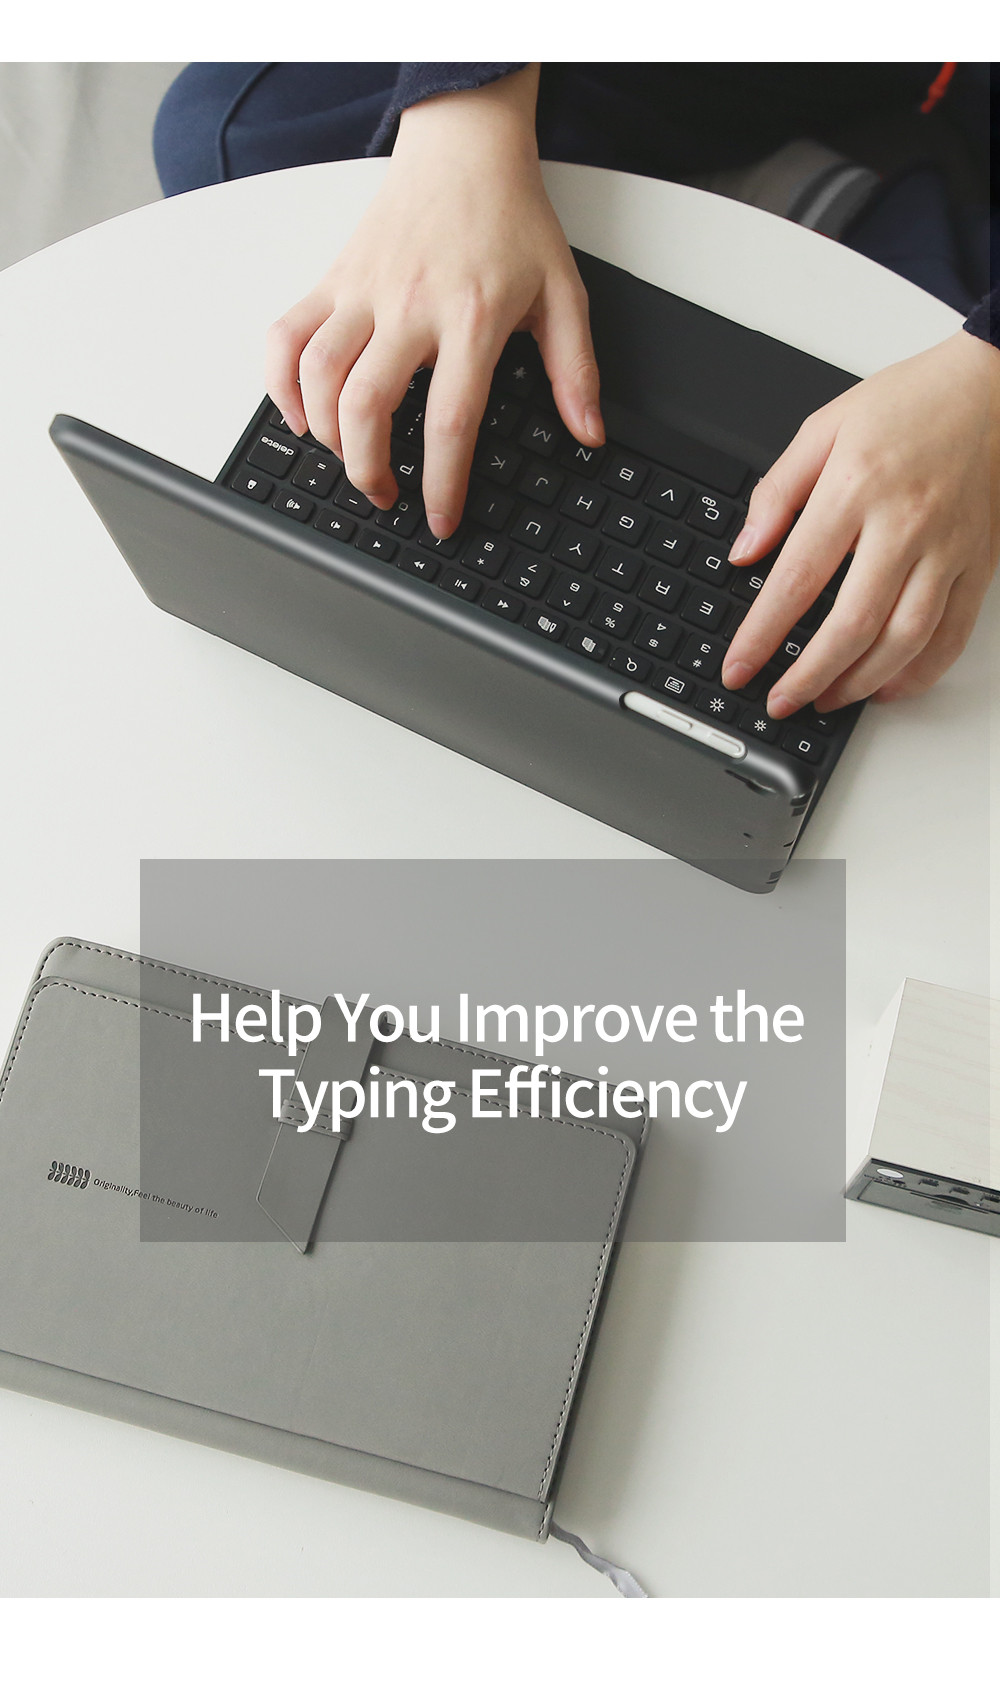 http://www.duxducis.com/wp-content/uploads/2019/04/ipad-10.5-bluetooth-keyboard-23.jpg